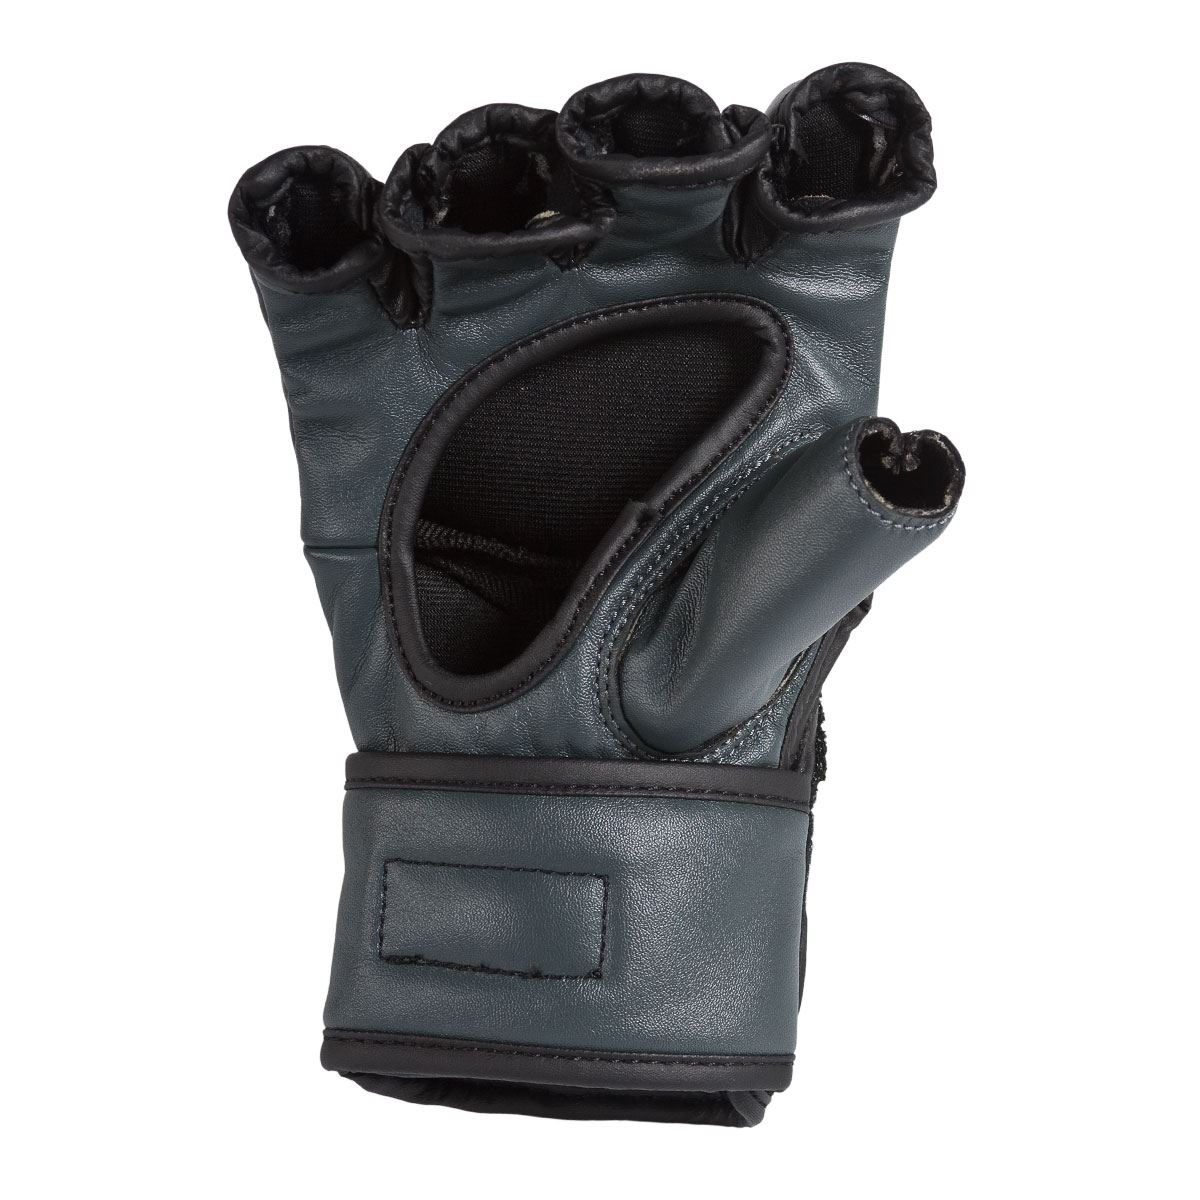 Workout Gloves Target: Century BOB XL Body Opponent Training Bag + UFC Gloves